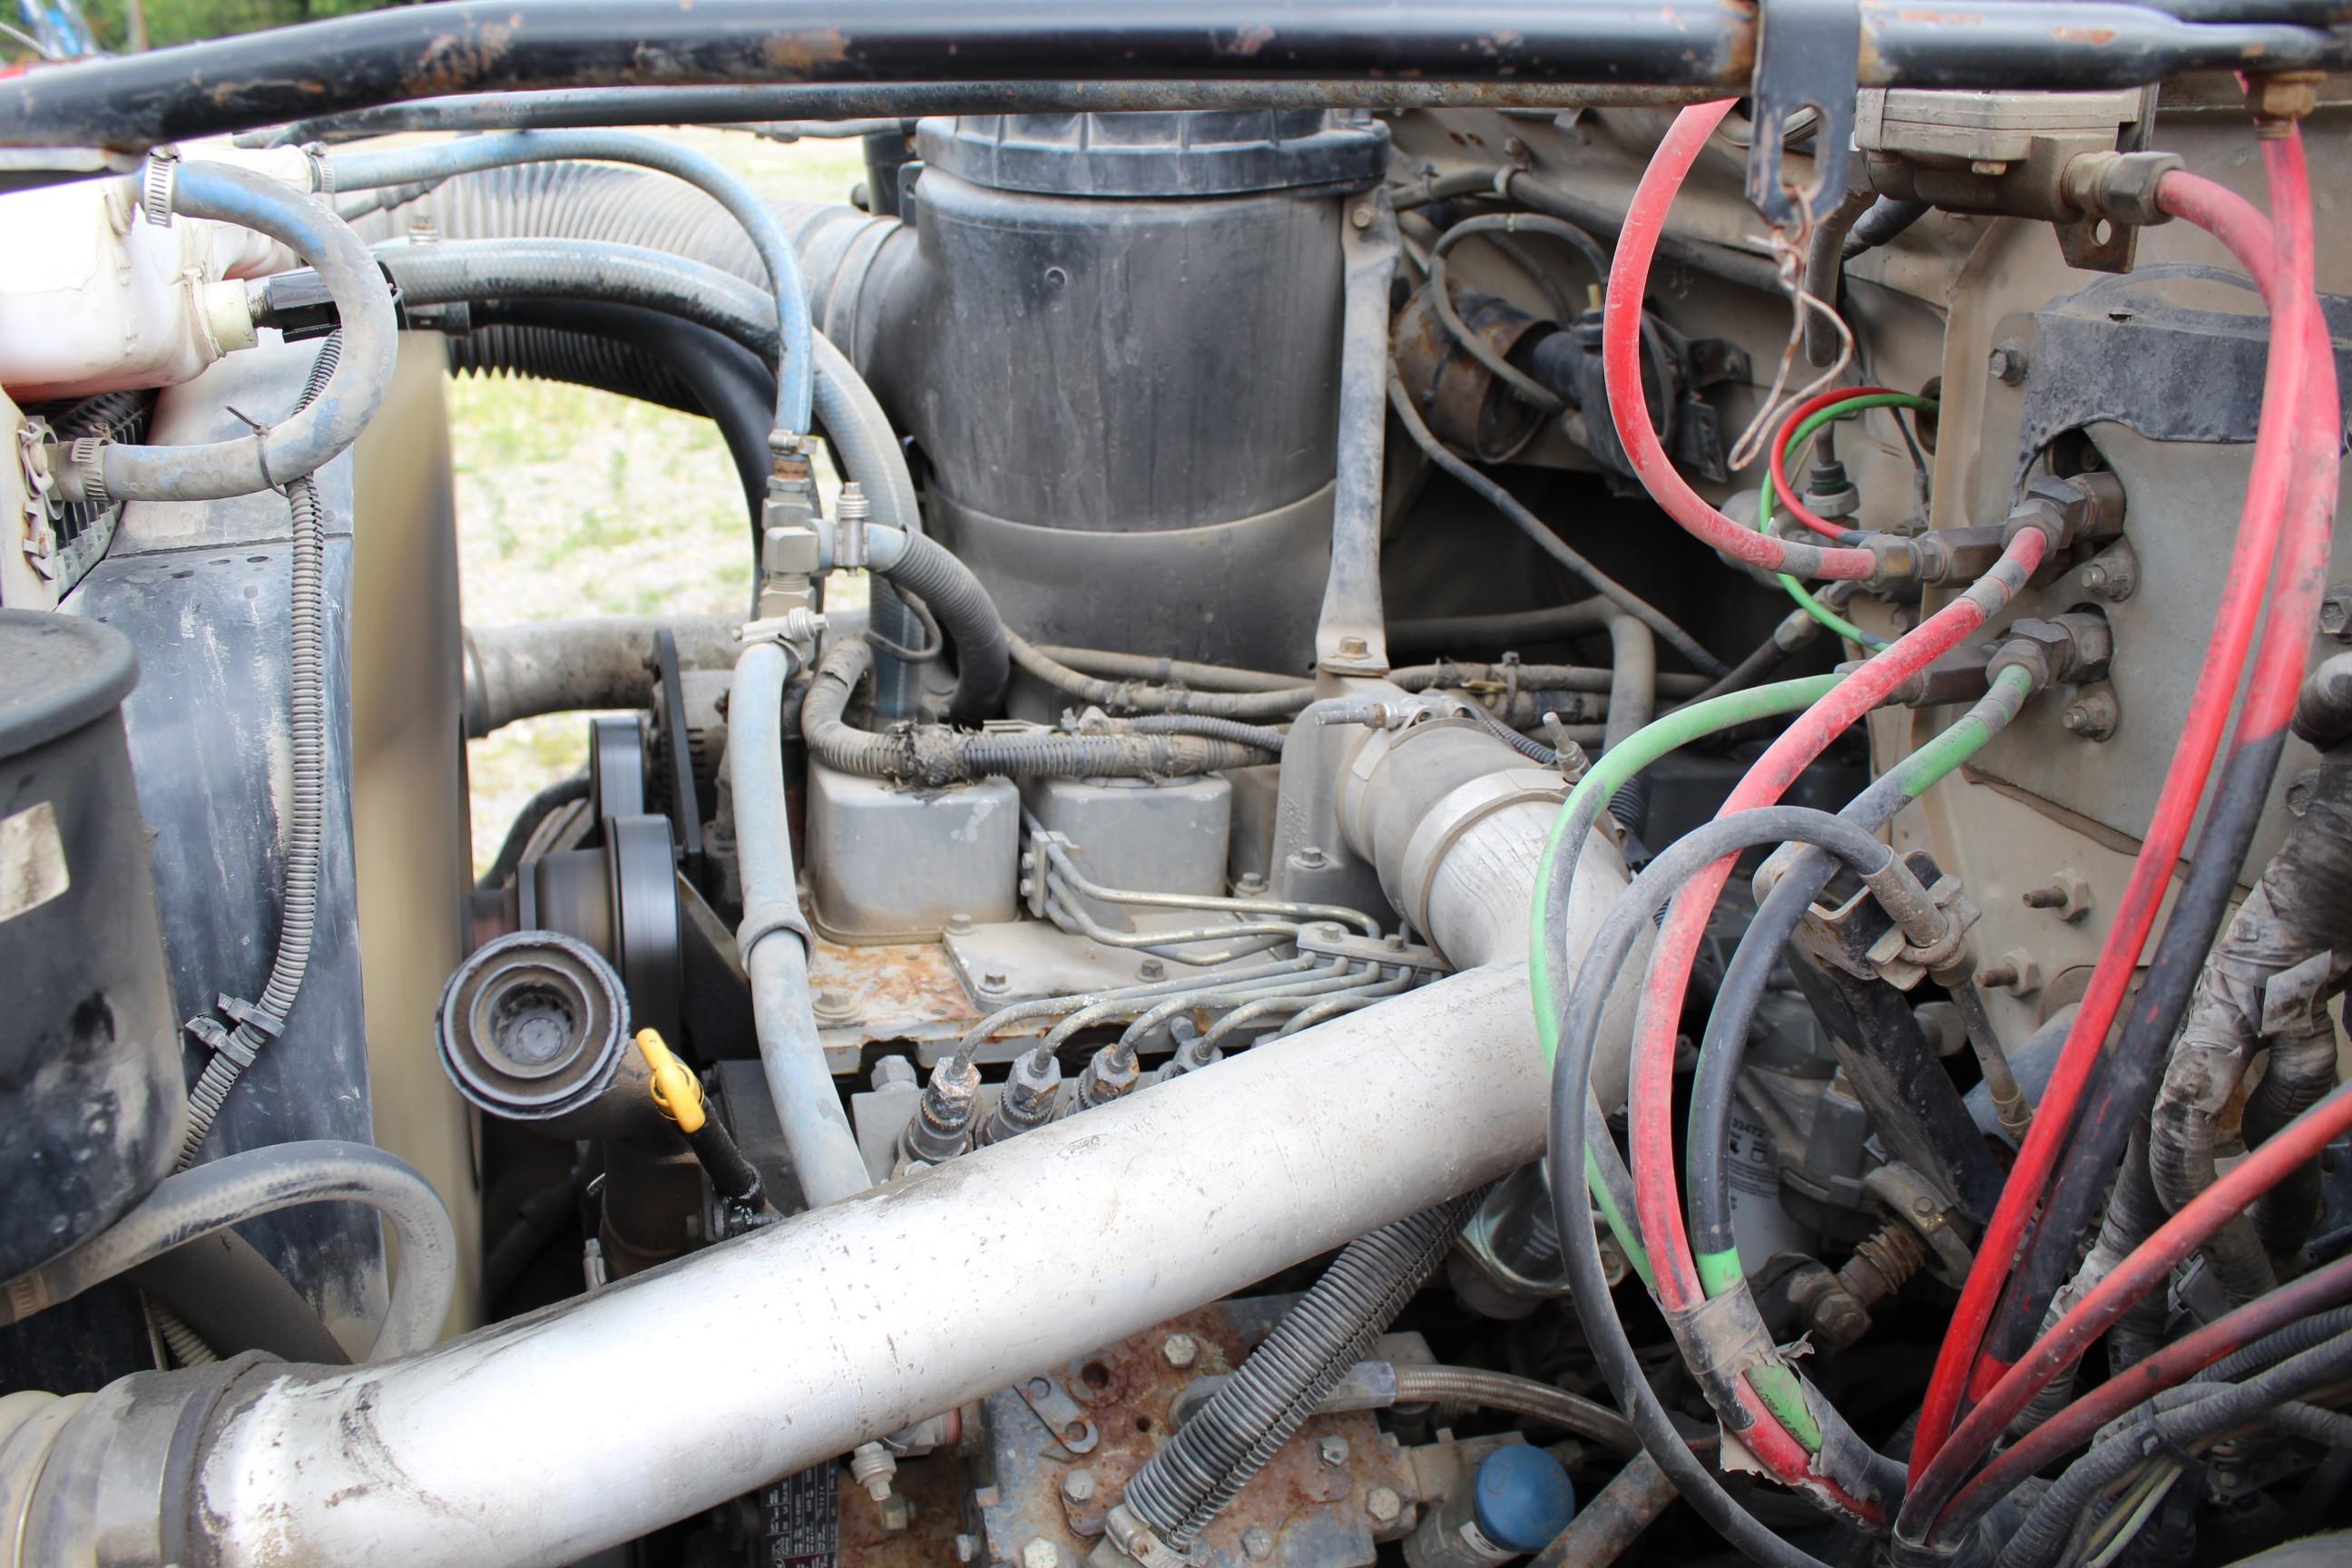 Lot 2 - 2016 MRL 4000 PT Paint Striper, s/n 04404 mounted on 1995 Ford F800 VIN 1FDWF80C1SVA44334